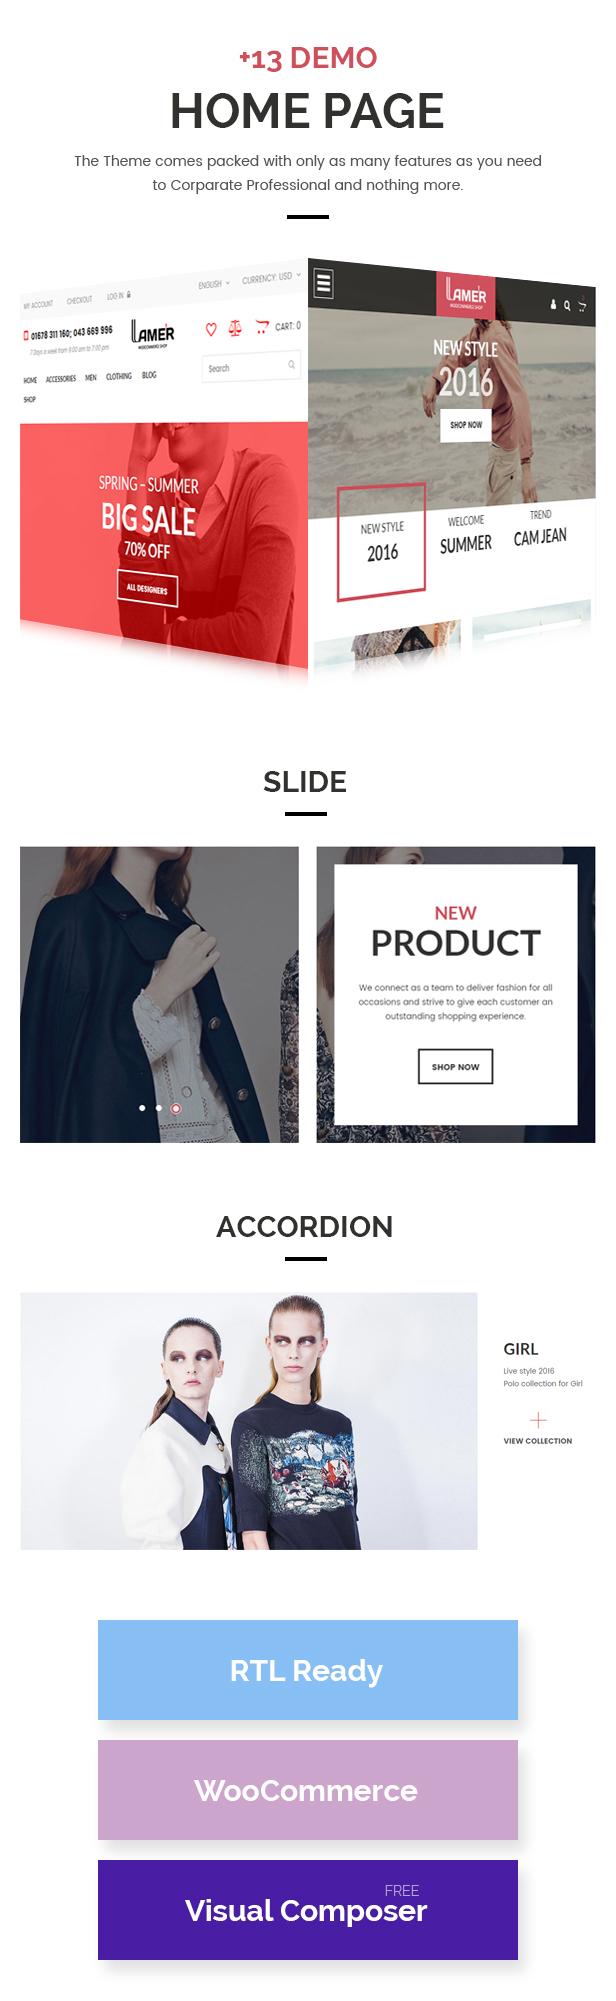 Lamer Mode - WooCommerce WordPress Template - 4